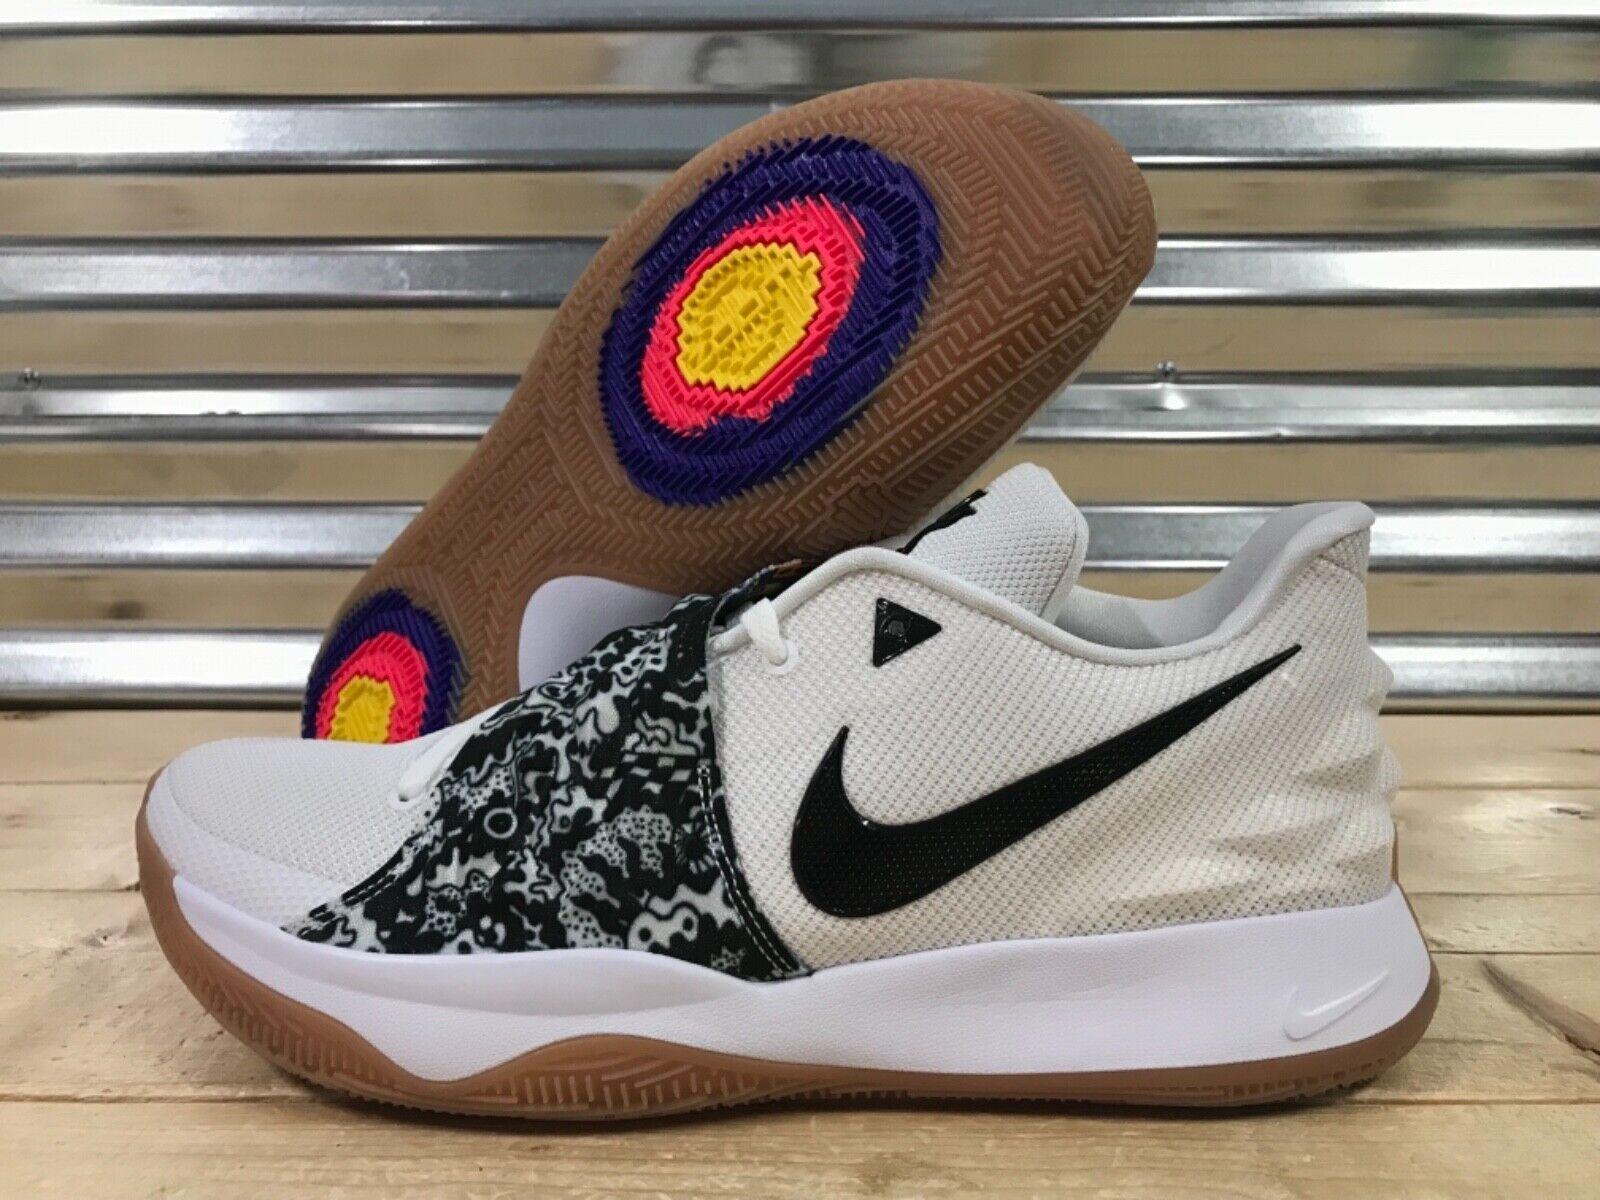 Nike Kyrie Irving Low Basketball shoes White Black Gum SZ ( AO8979-100 )